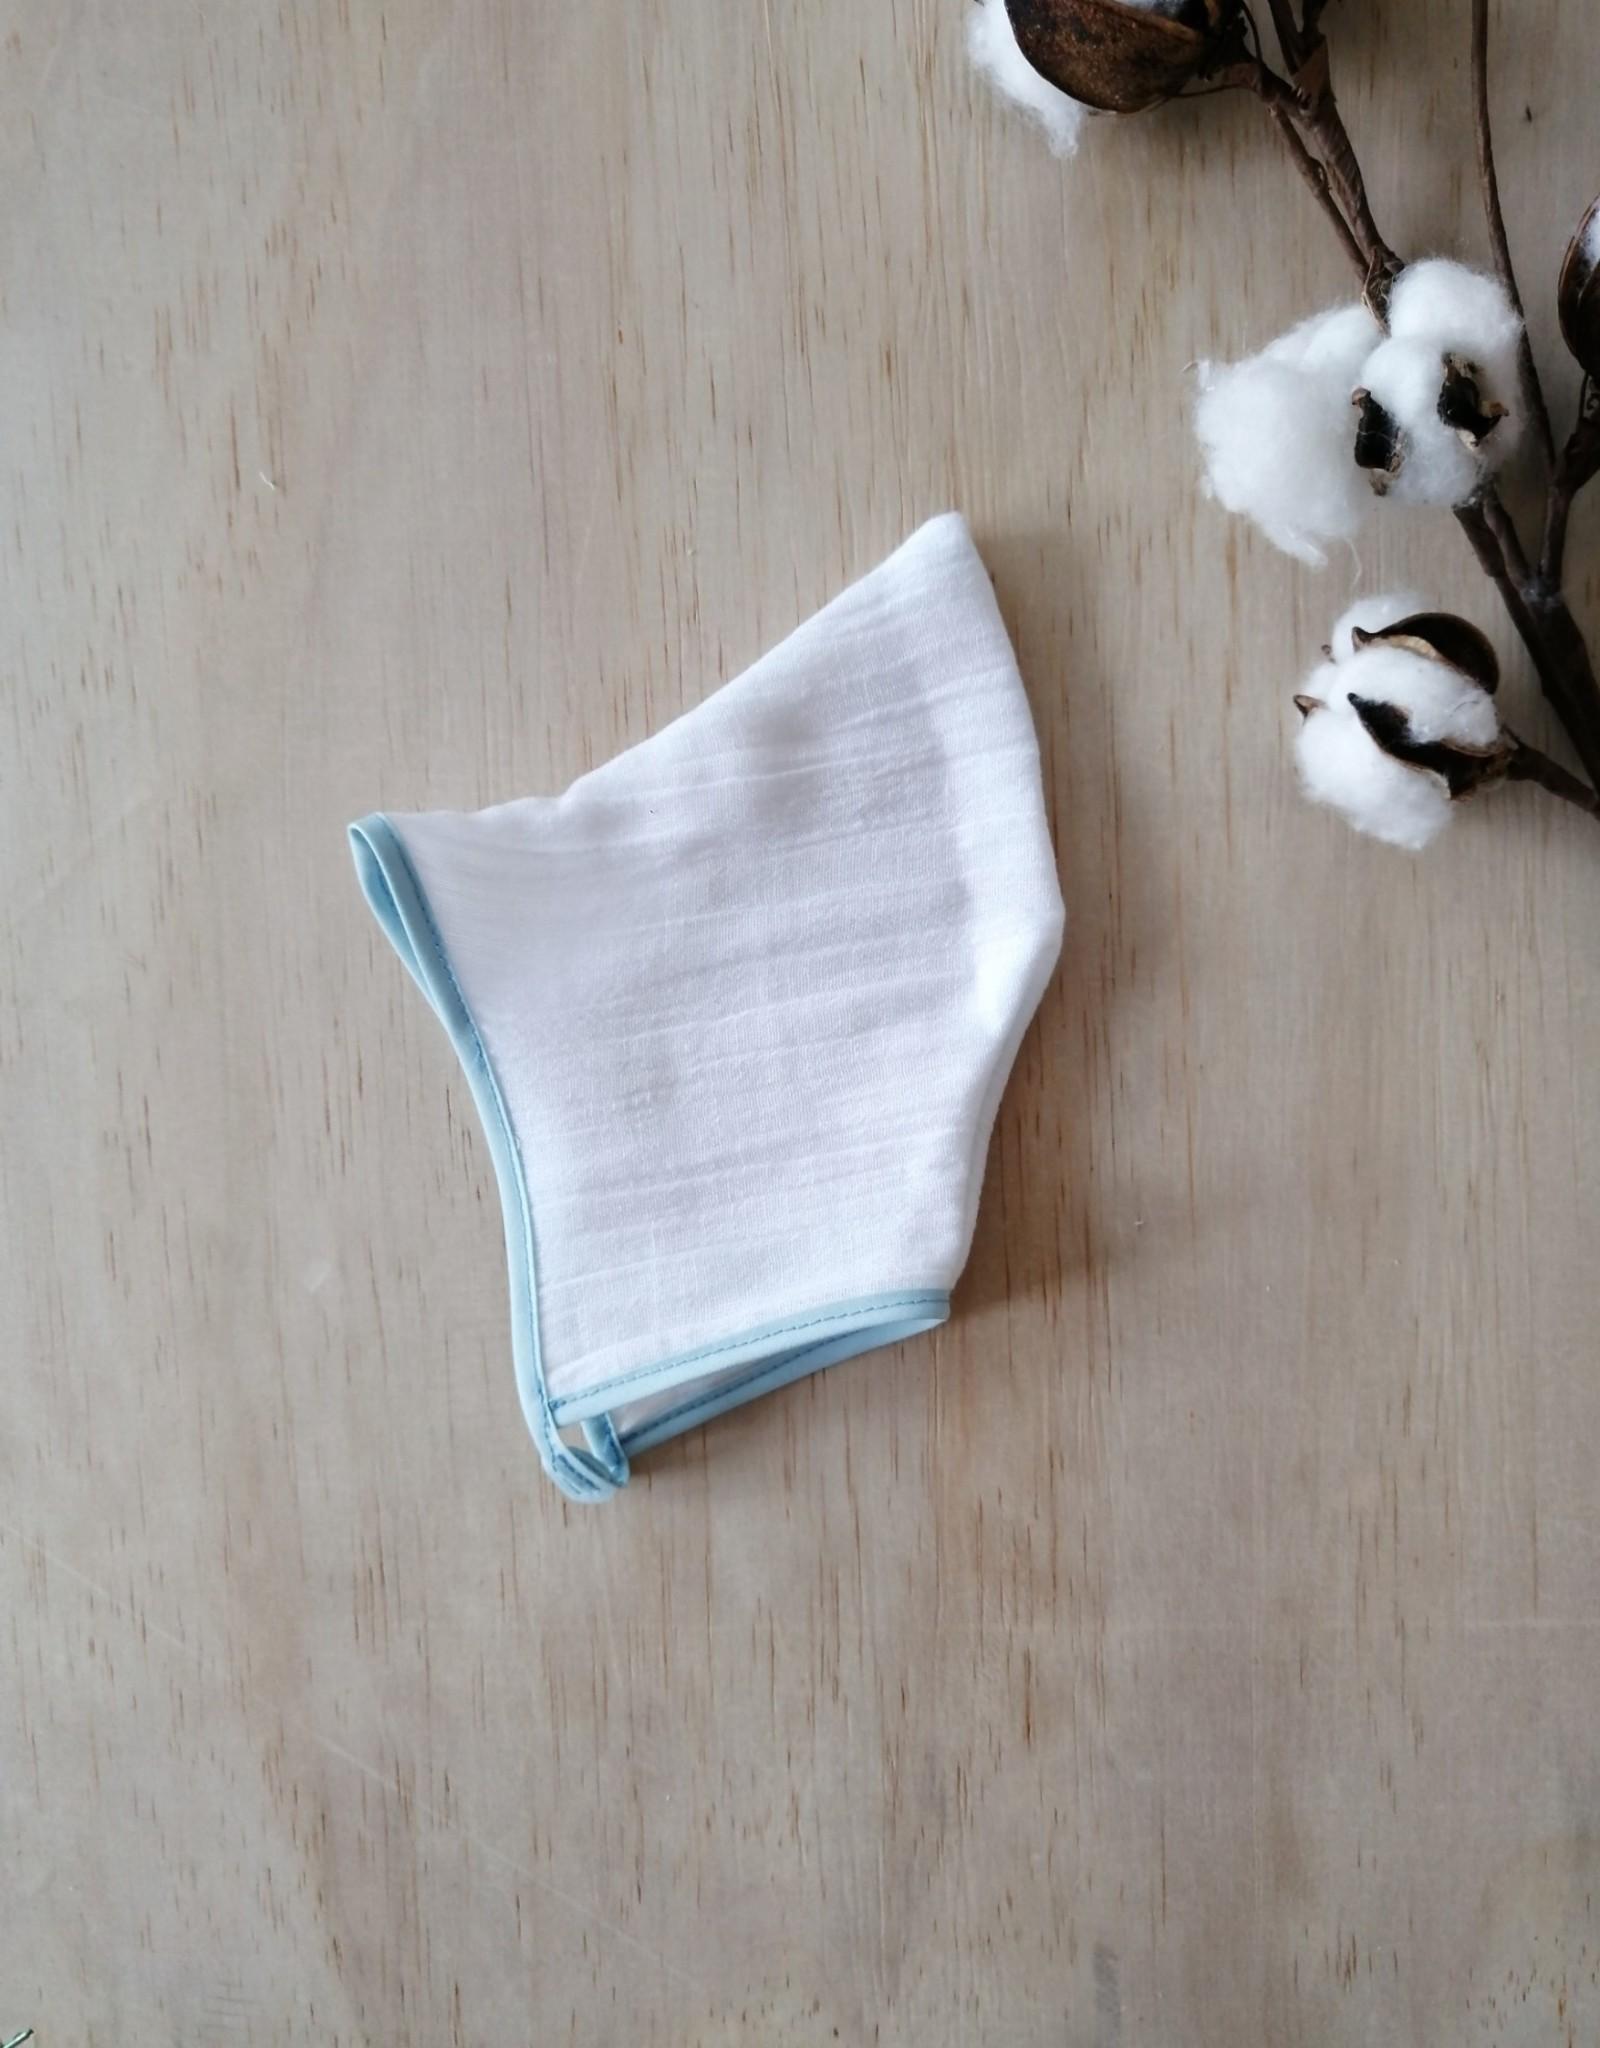 Paola Reina Capine en tissu - Blanc et turquoise